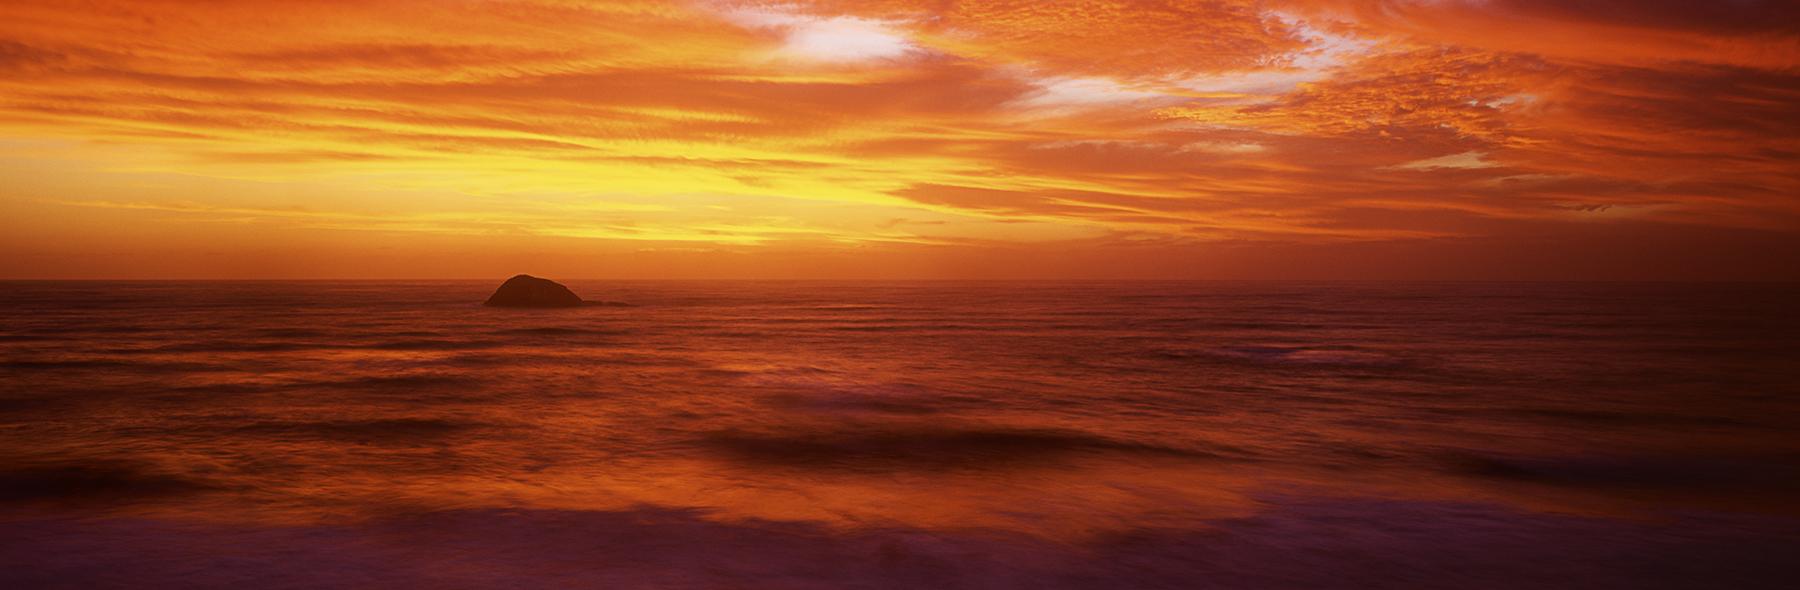 Murawai Magic, Murawai Beach, New Zealand. A Limited Edition Fine Art Landscape Photograph by Richard Hume